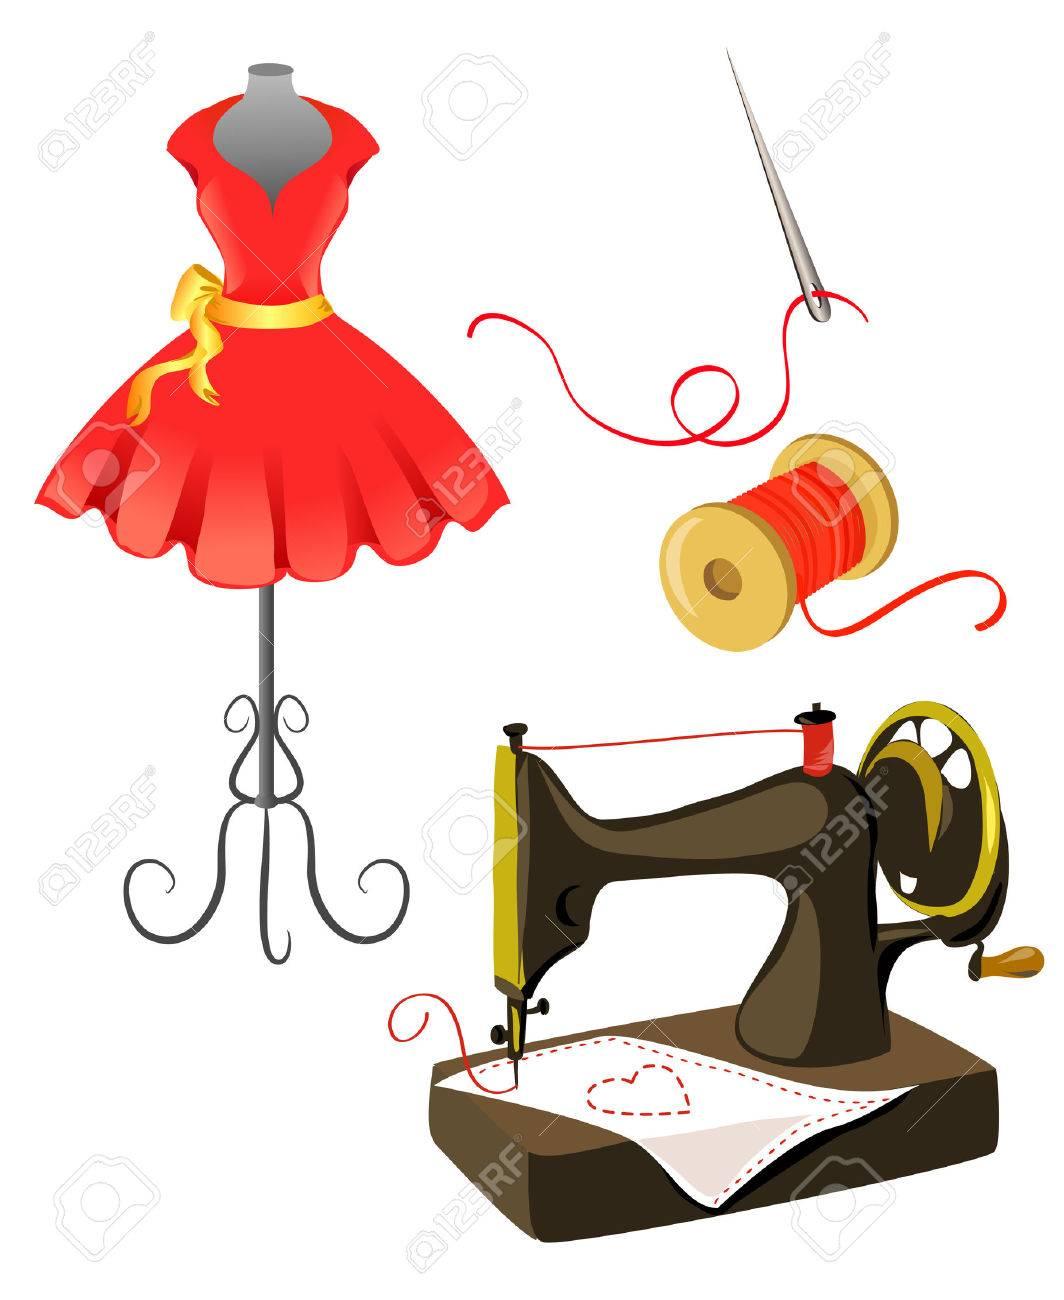 mannequin, dress, sewing machine isolated. Standard-Bild - 26546418